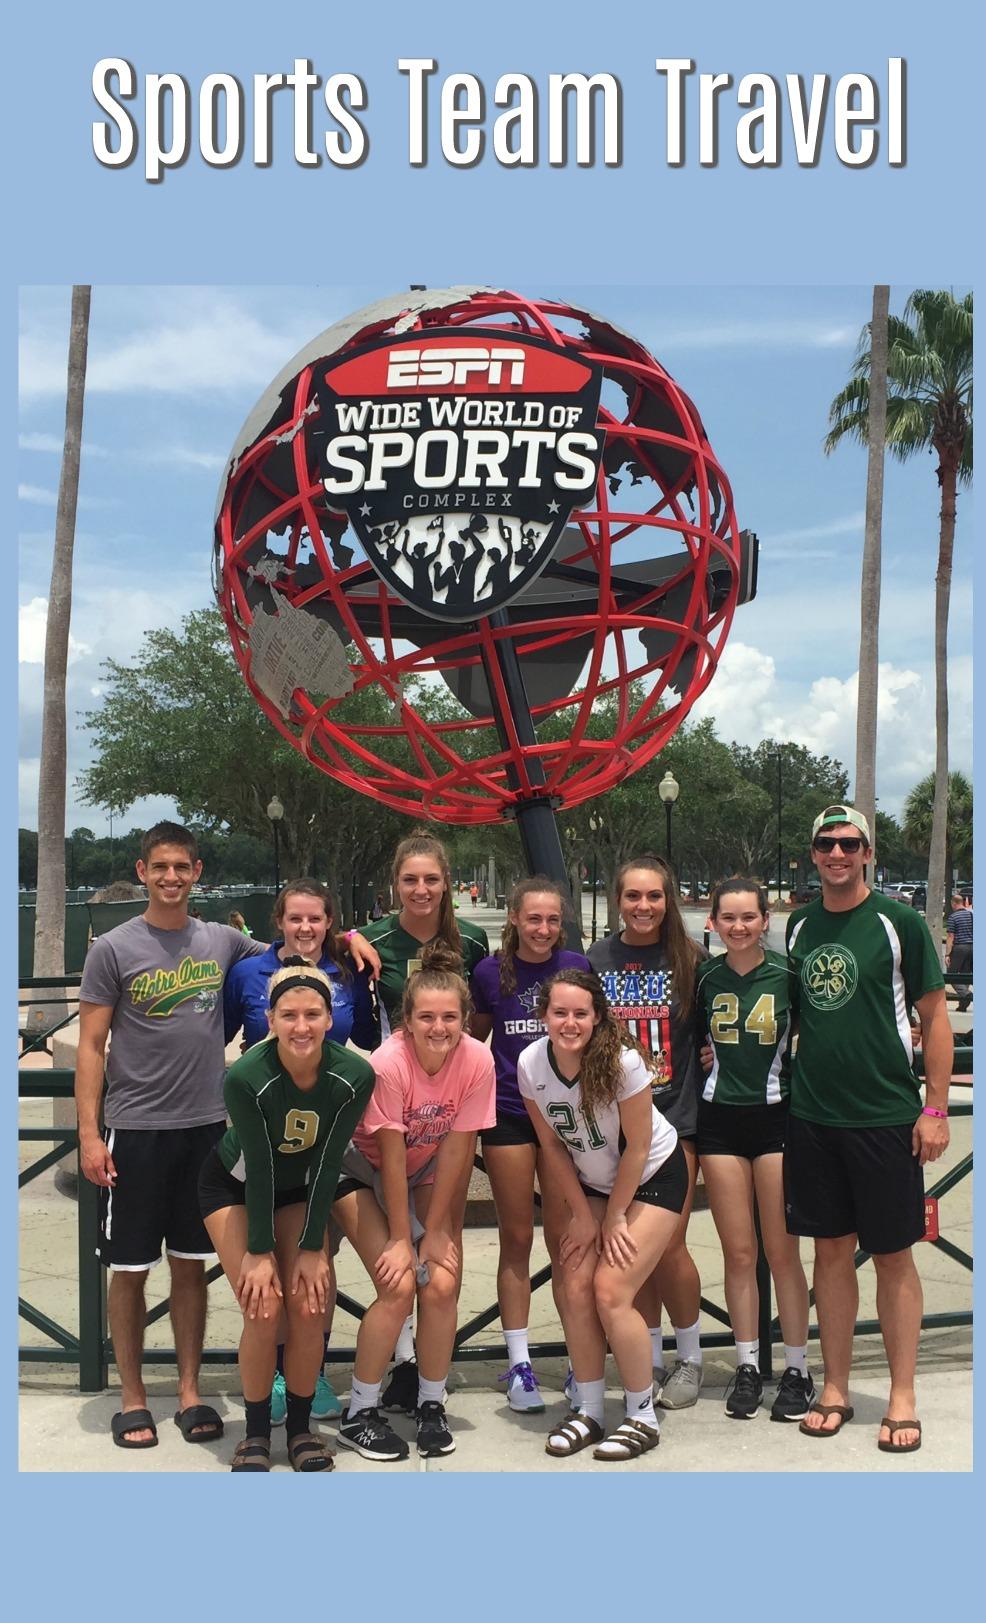 Sports Team Travel